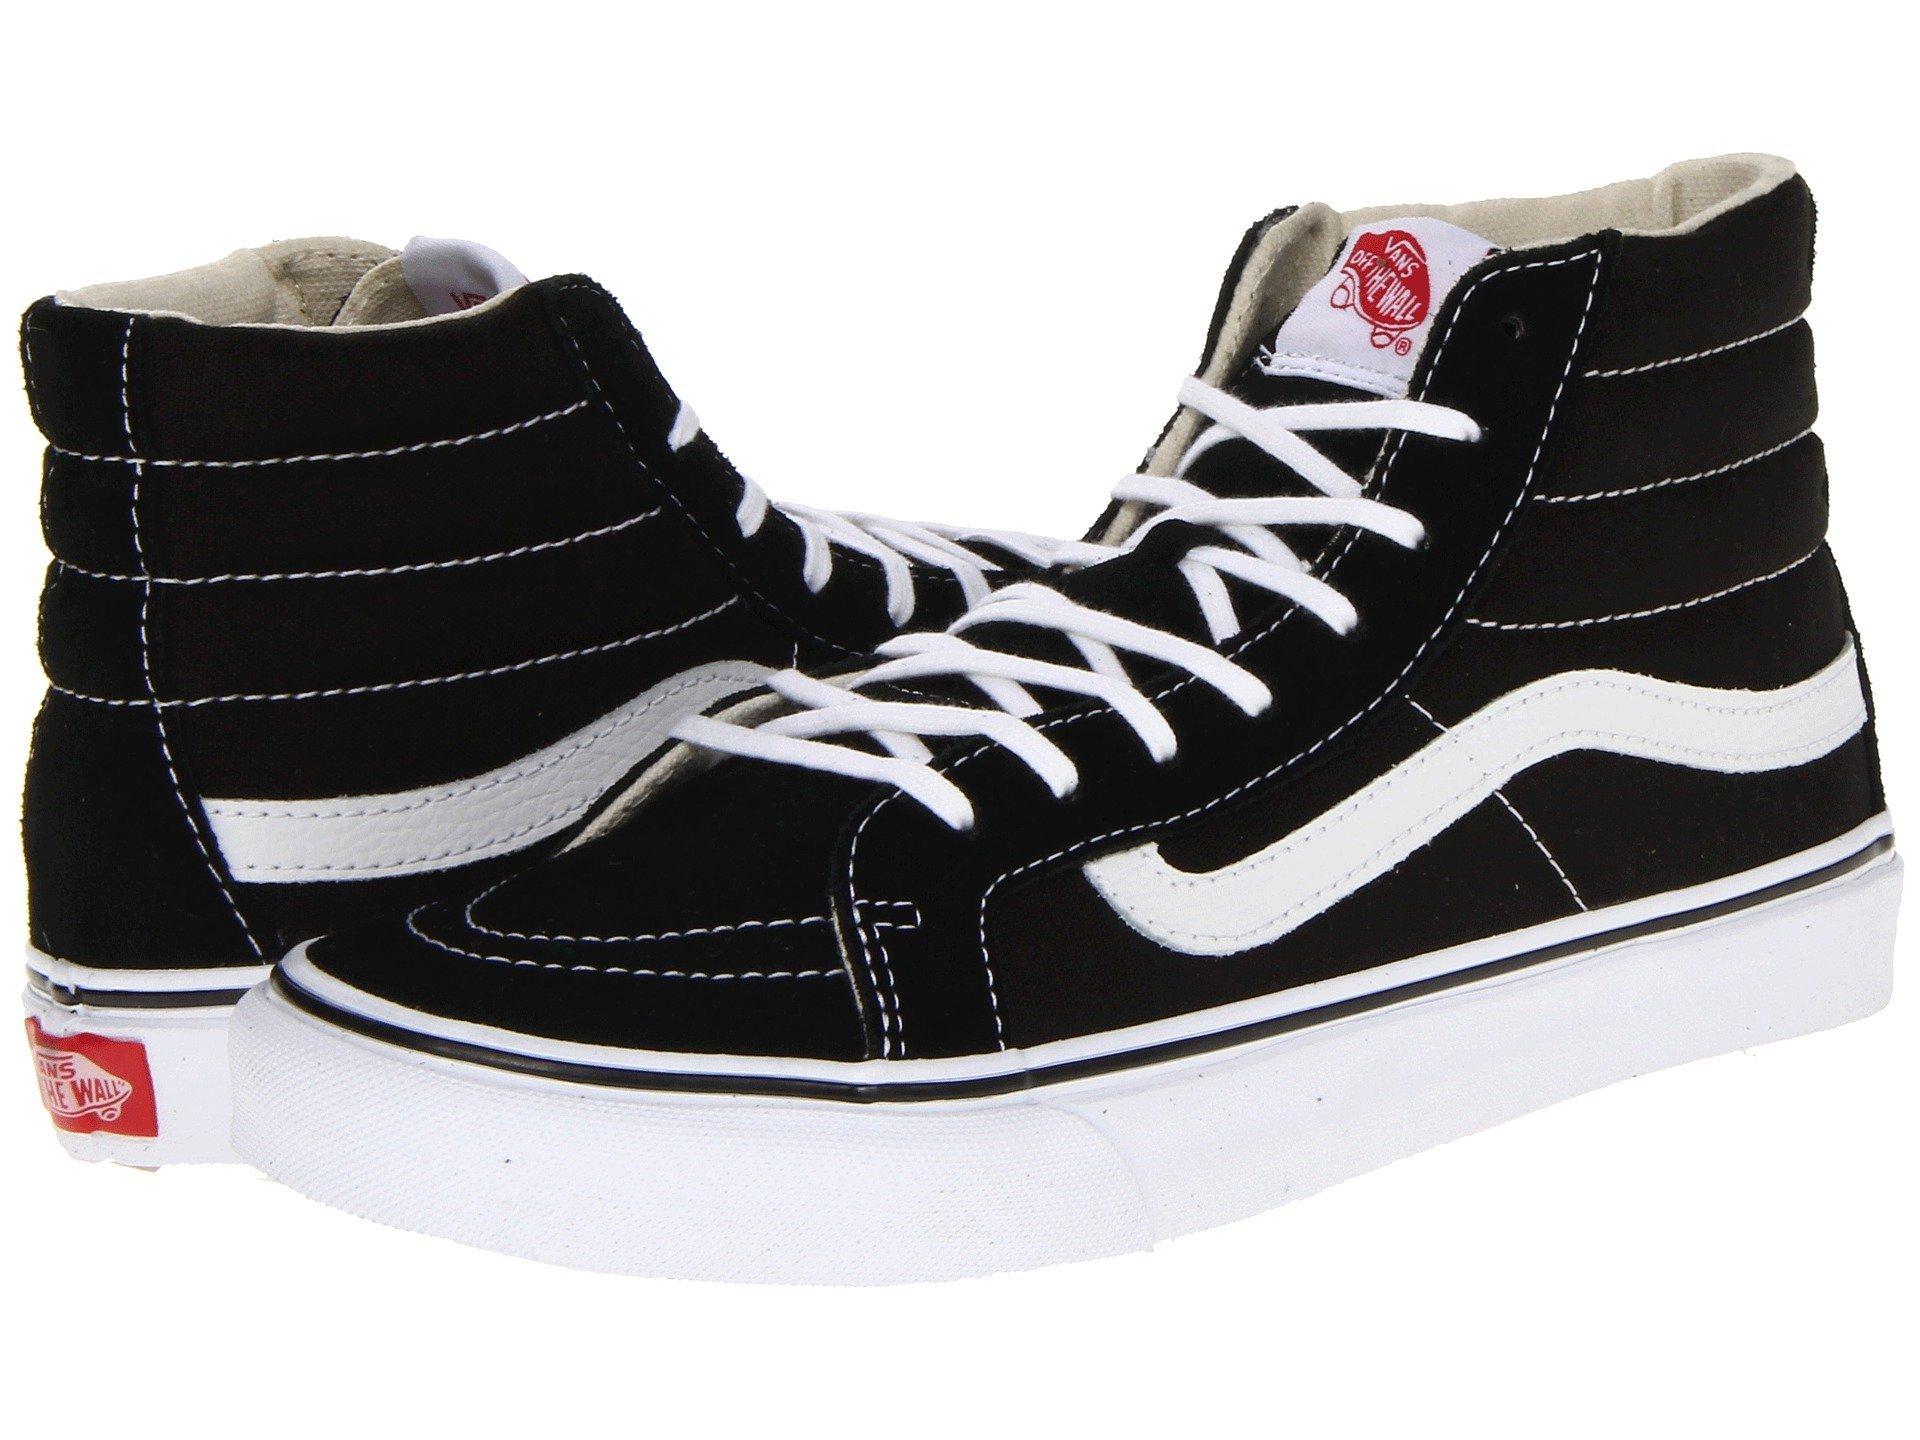 Vans Mens Sk8-Hi Slim Hight Top Lace up Skateboarding Shoes (8 B(M) US Women/6.5 D(M) US Men, Black/True White)